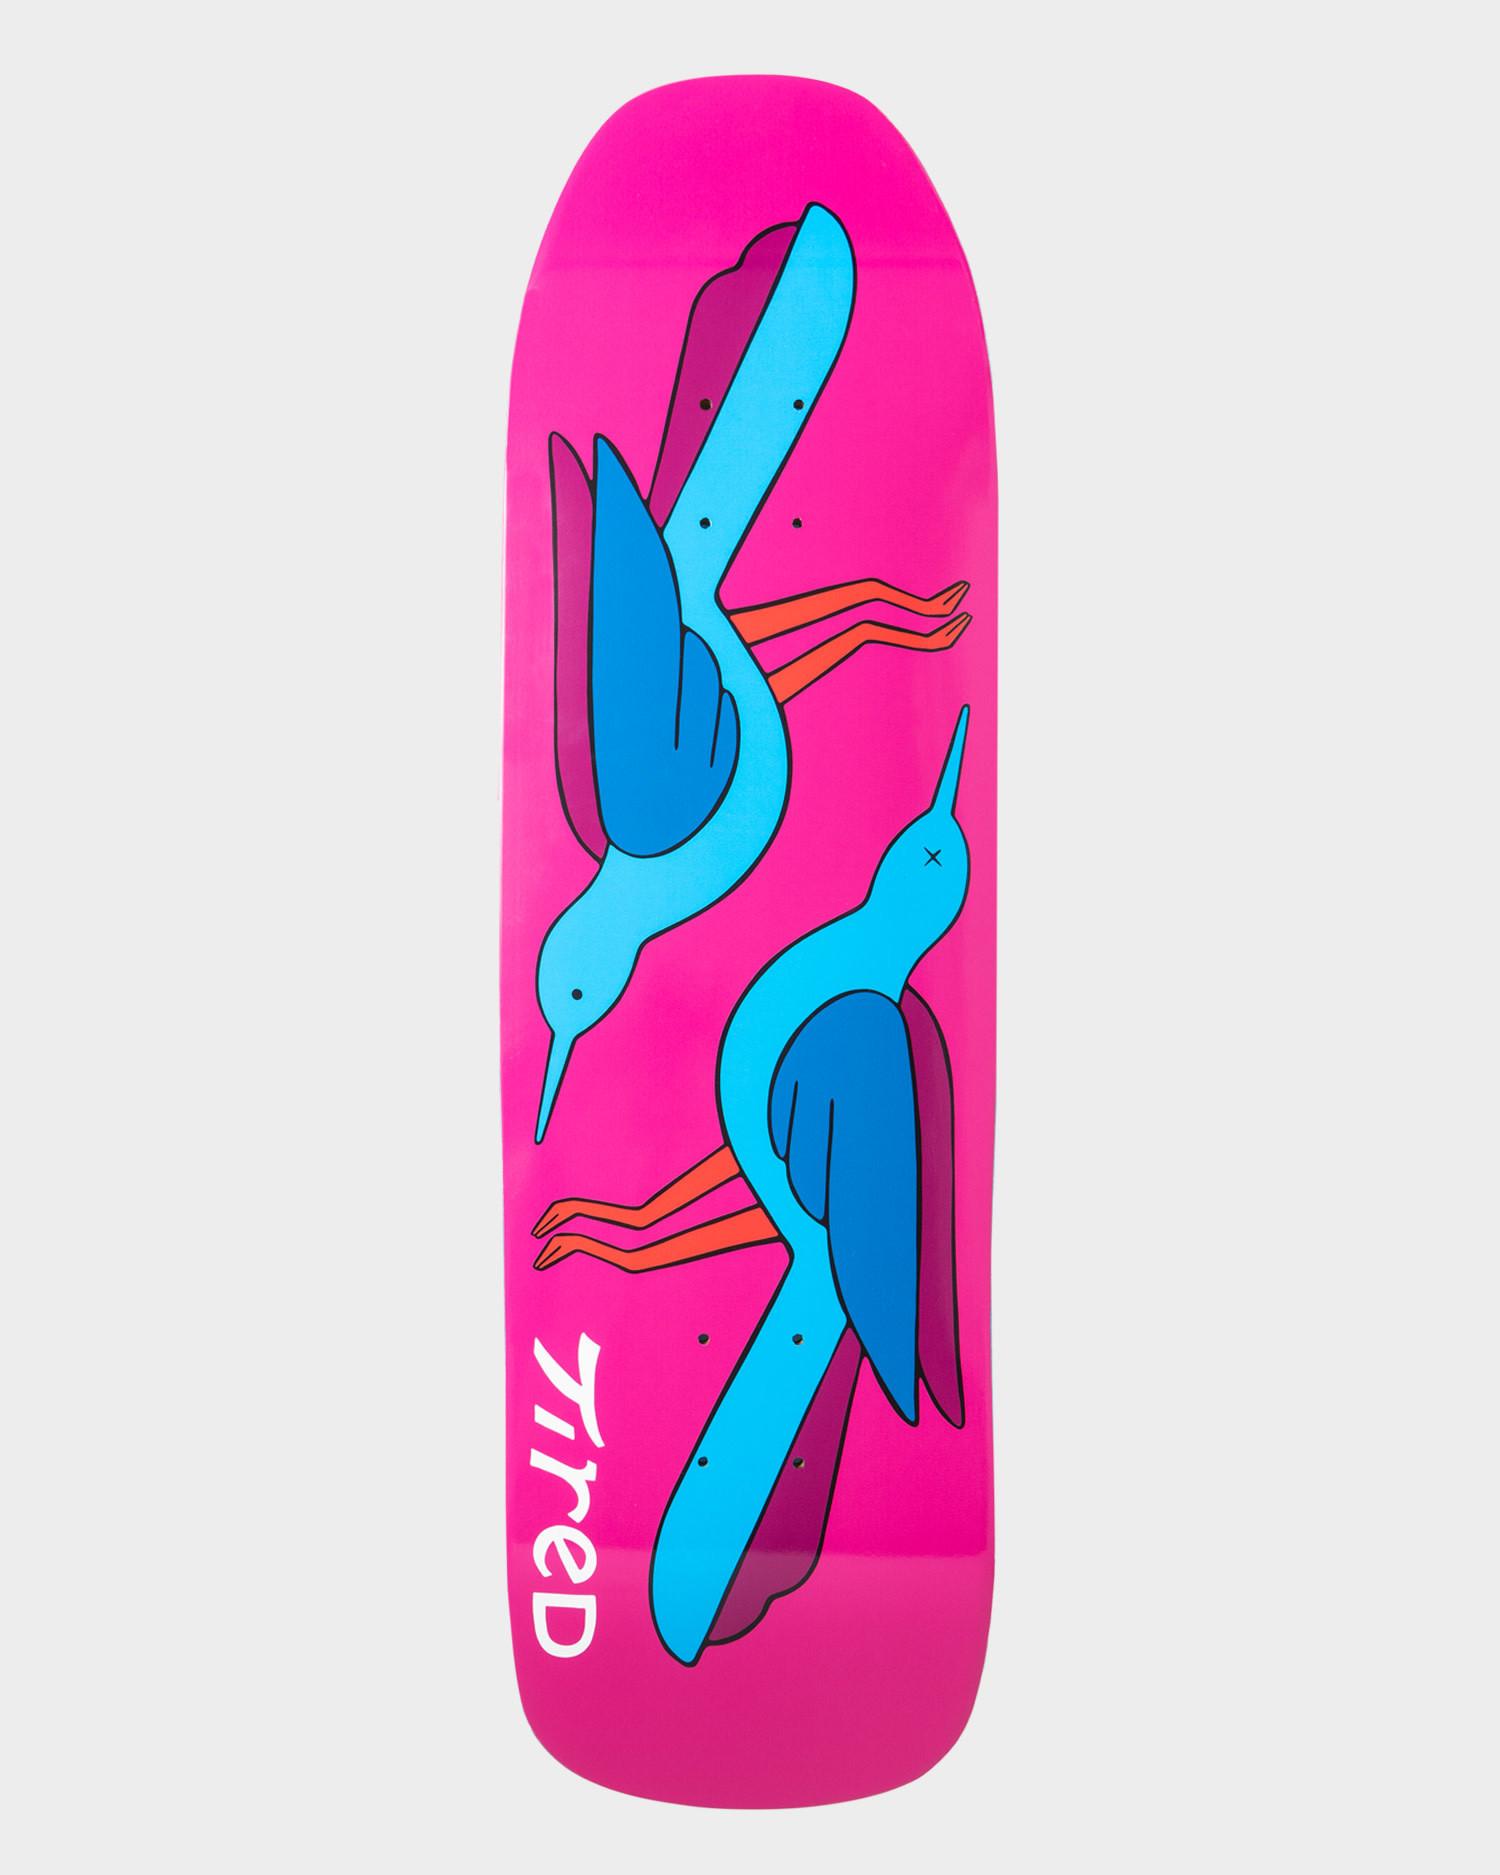 Tired Birds Skateboard Stumpnose 9